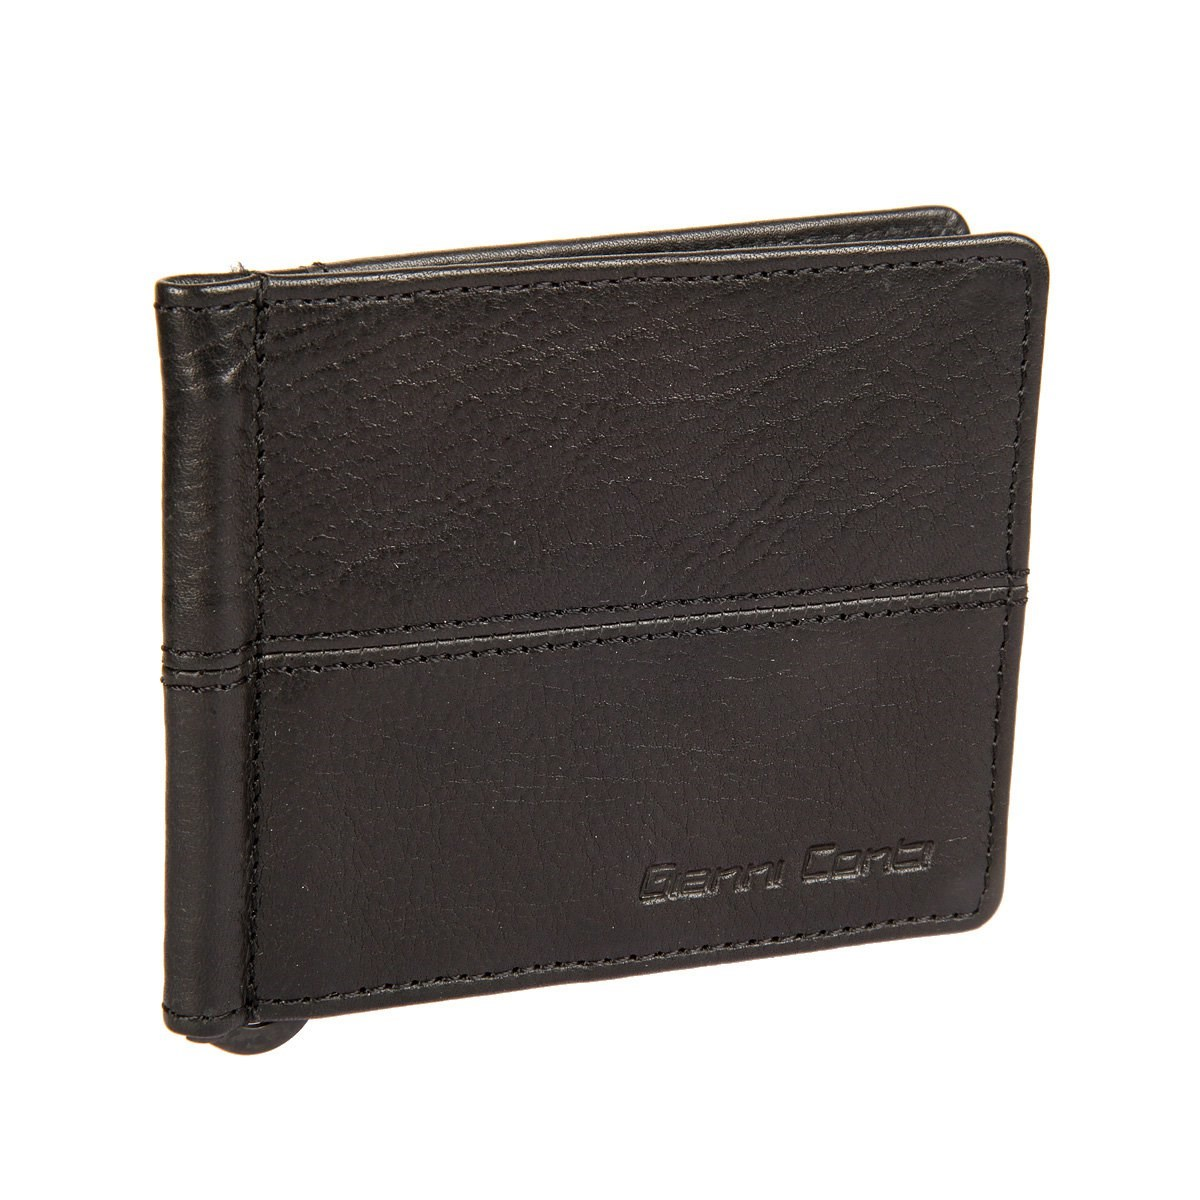 Money clip Gianni Conti 1137466E black edcgear abs double sides slim money clip card holder